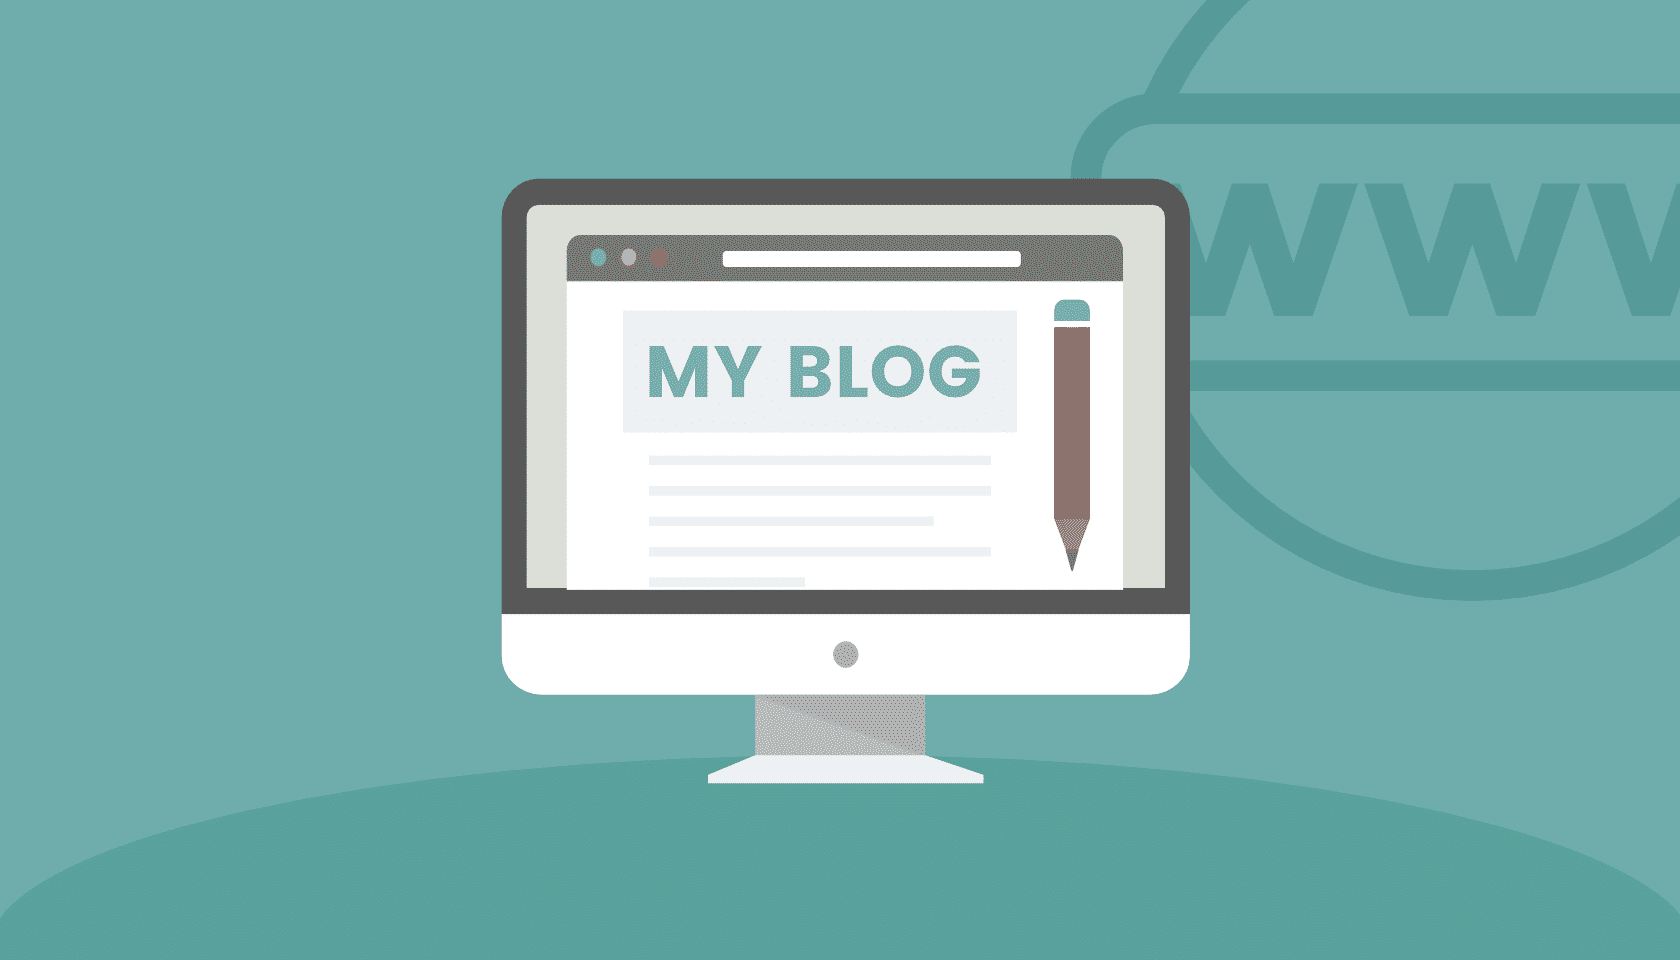 15 Best Blog Name Generator Tools & Websites in 2019